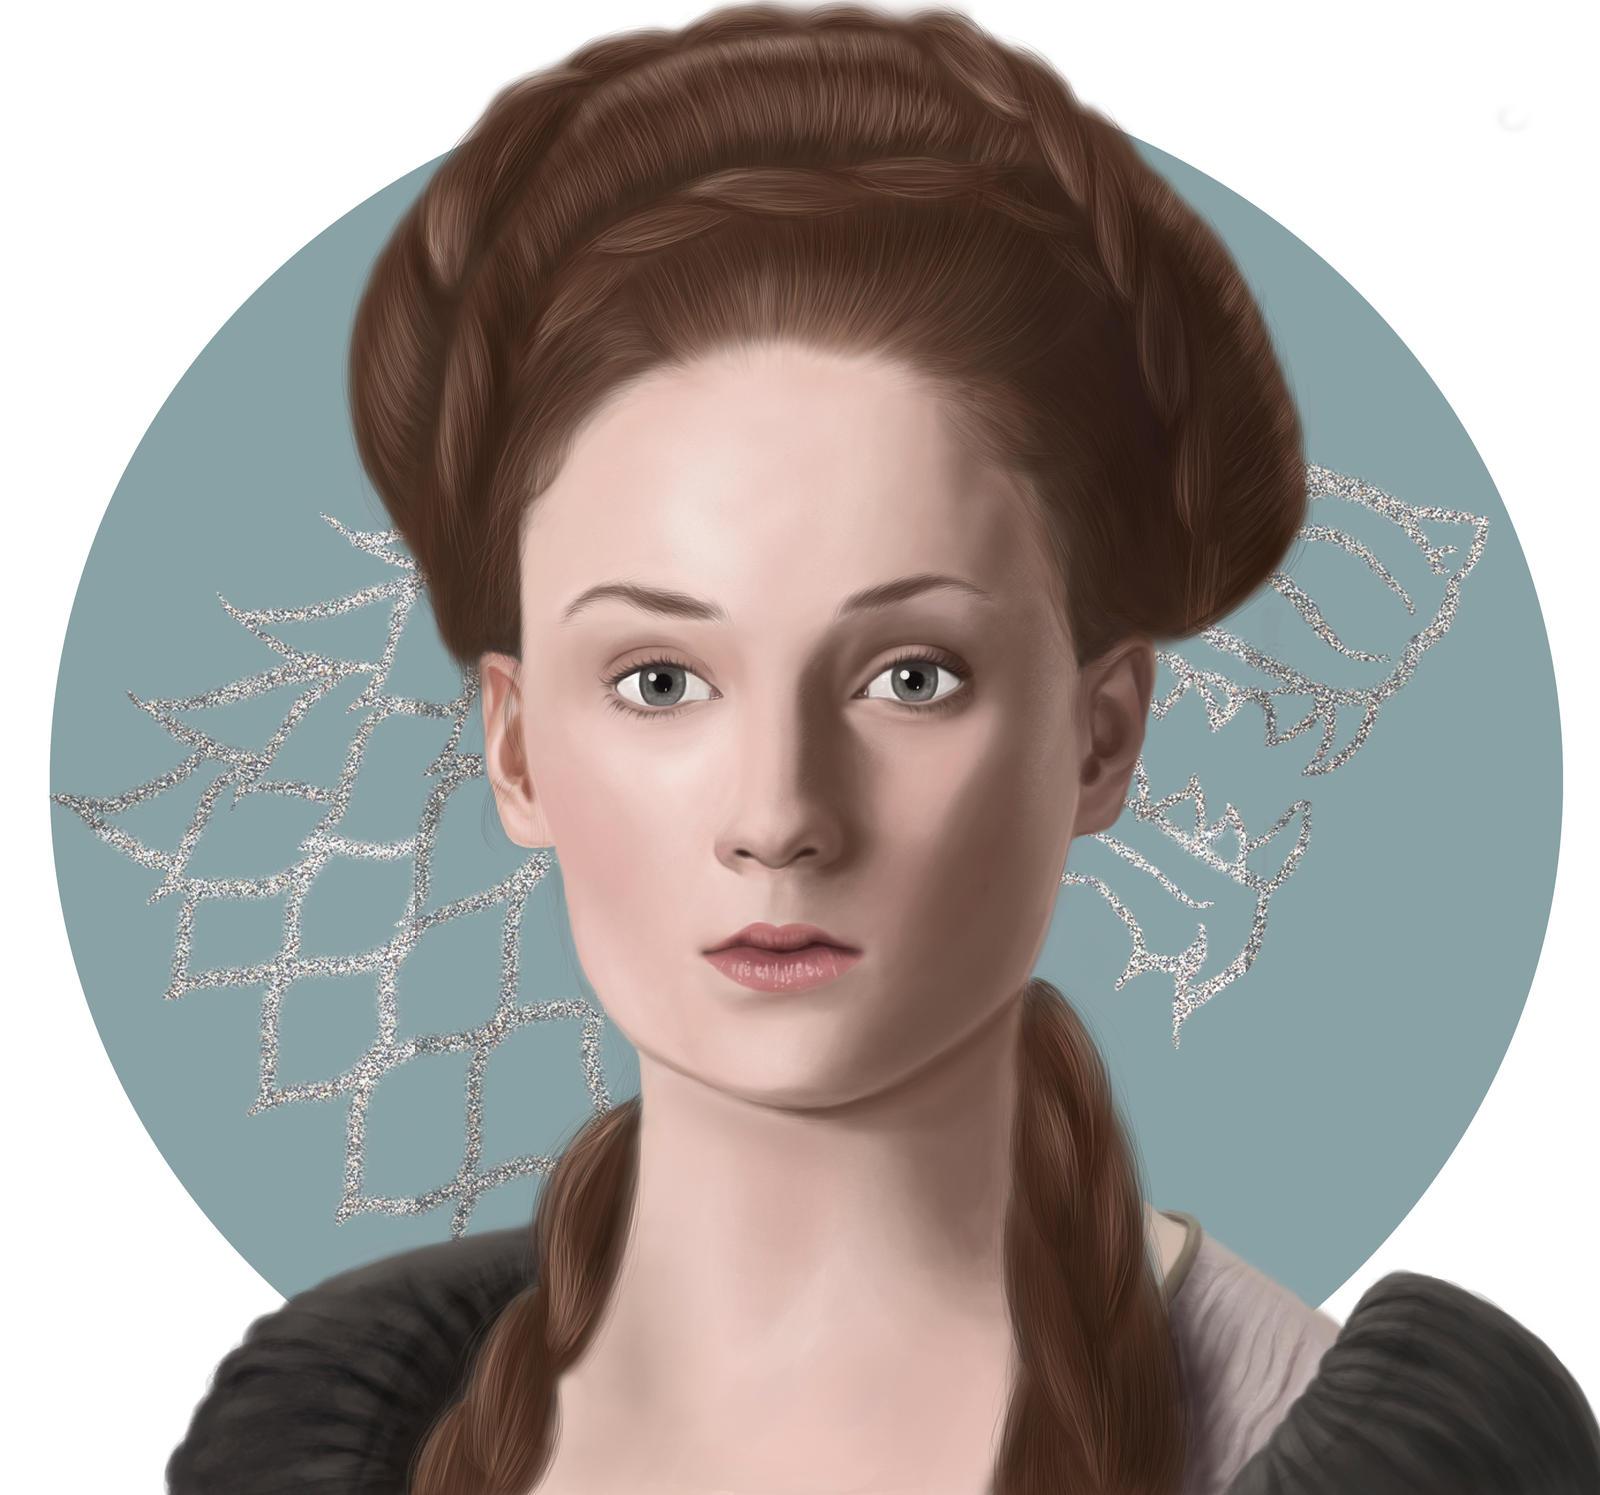 Sansa Stark by MeisnerIrina